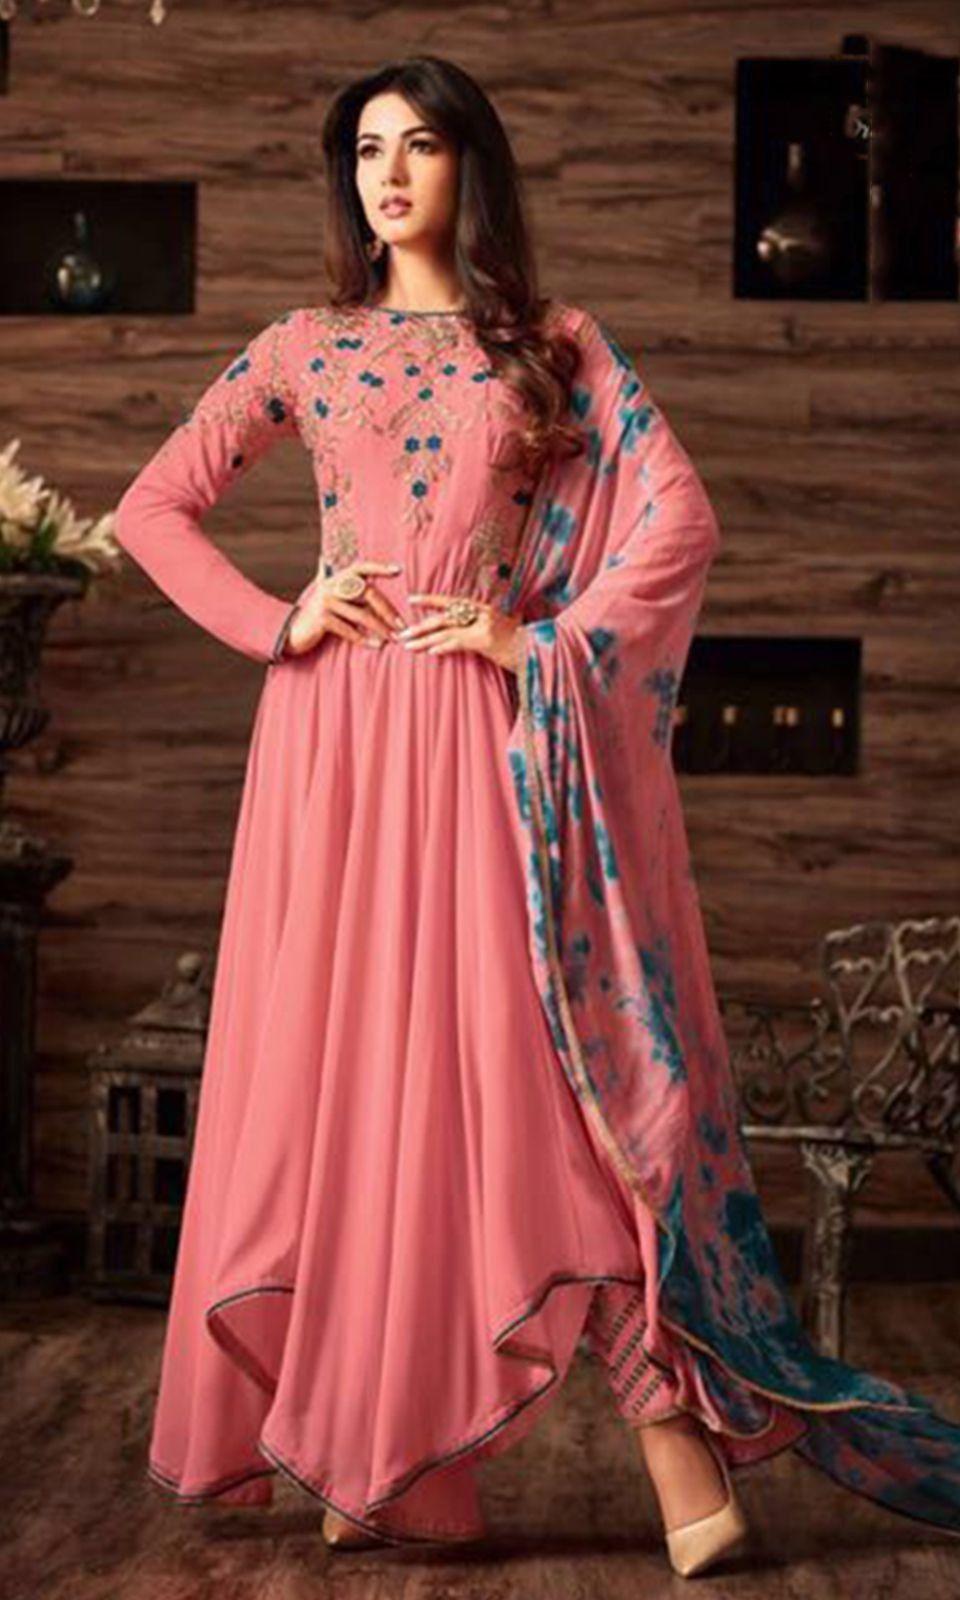 6a1127ed0 Buy online  Pink Floor Touch Frock  Suit (SKU Code   SUEBRMS4808) at  Ishimaya Fashion.